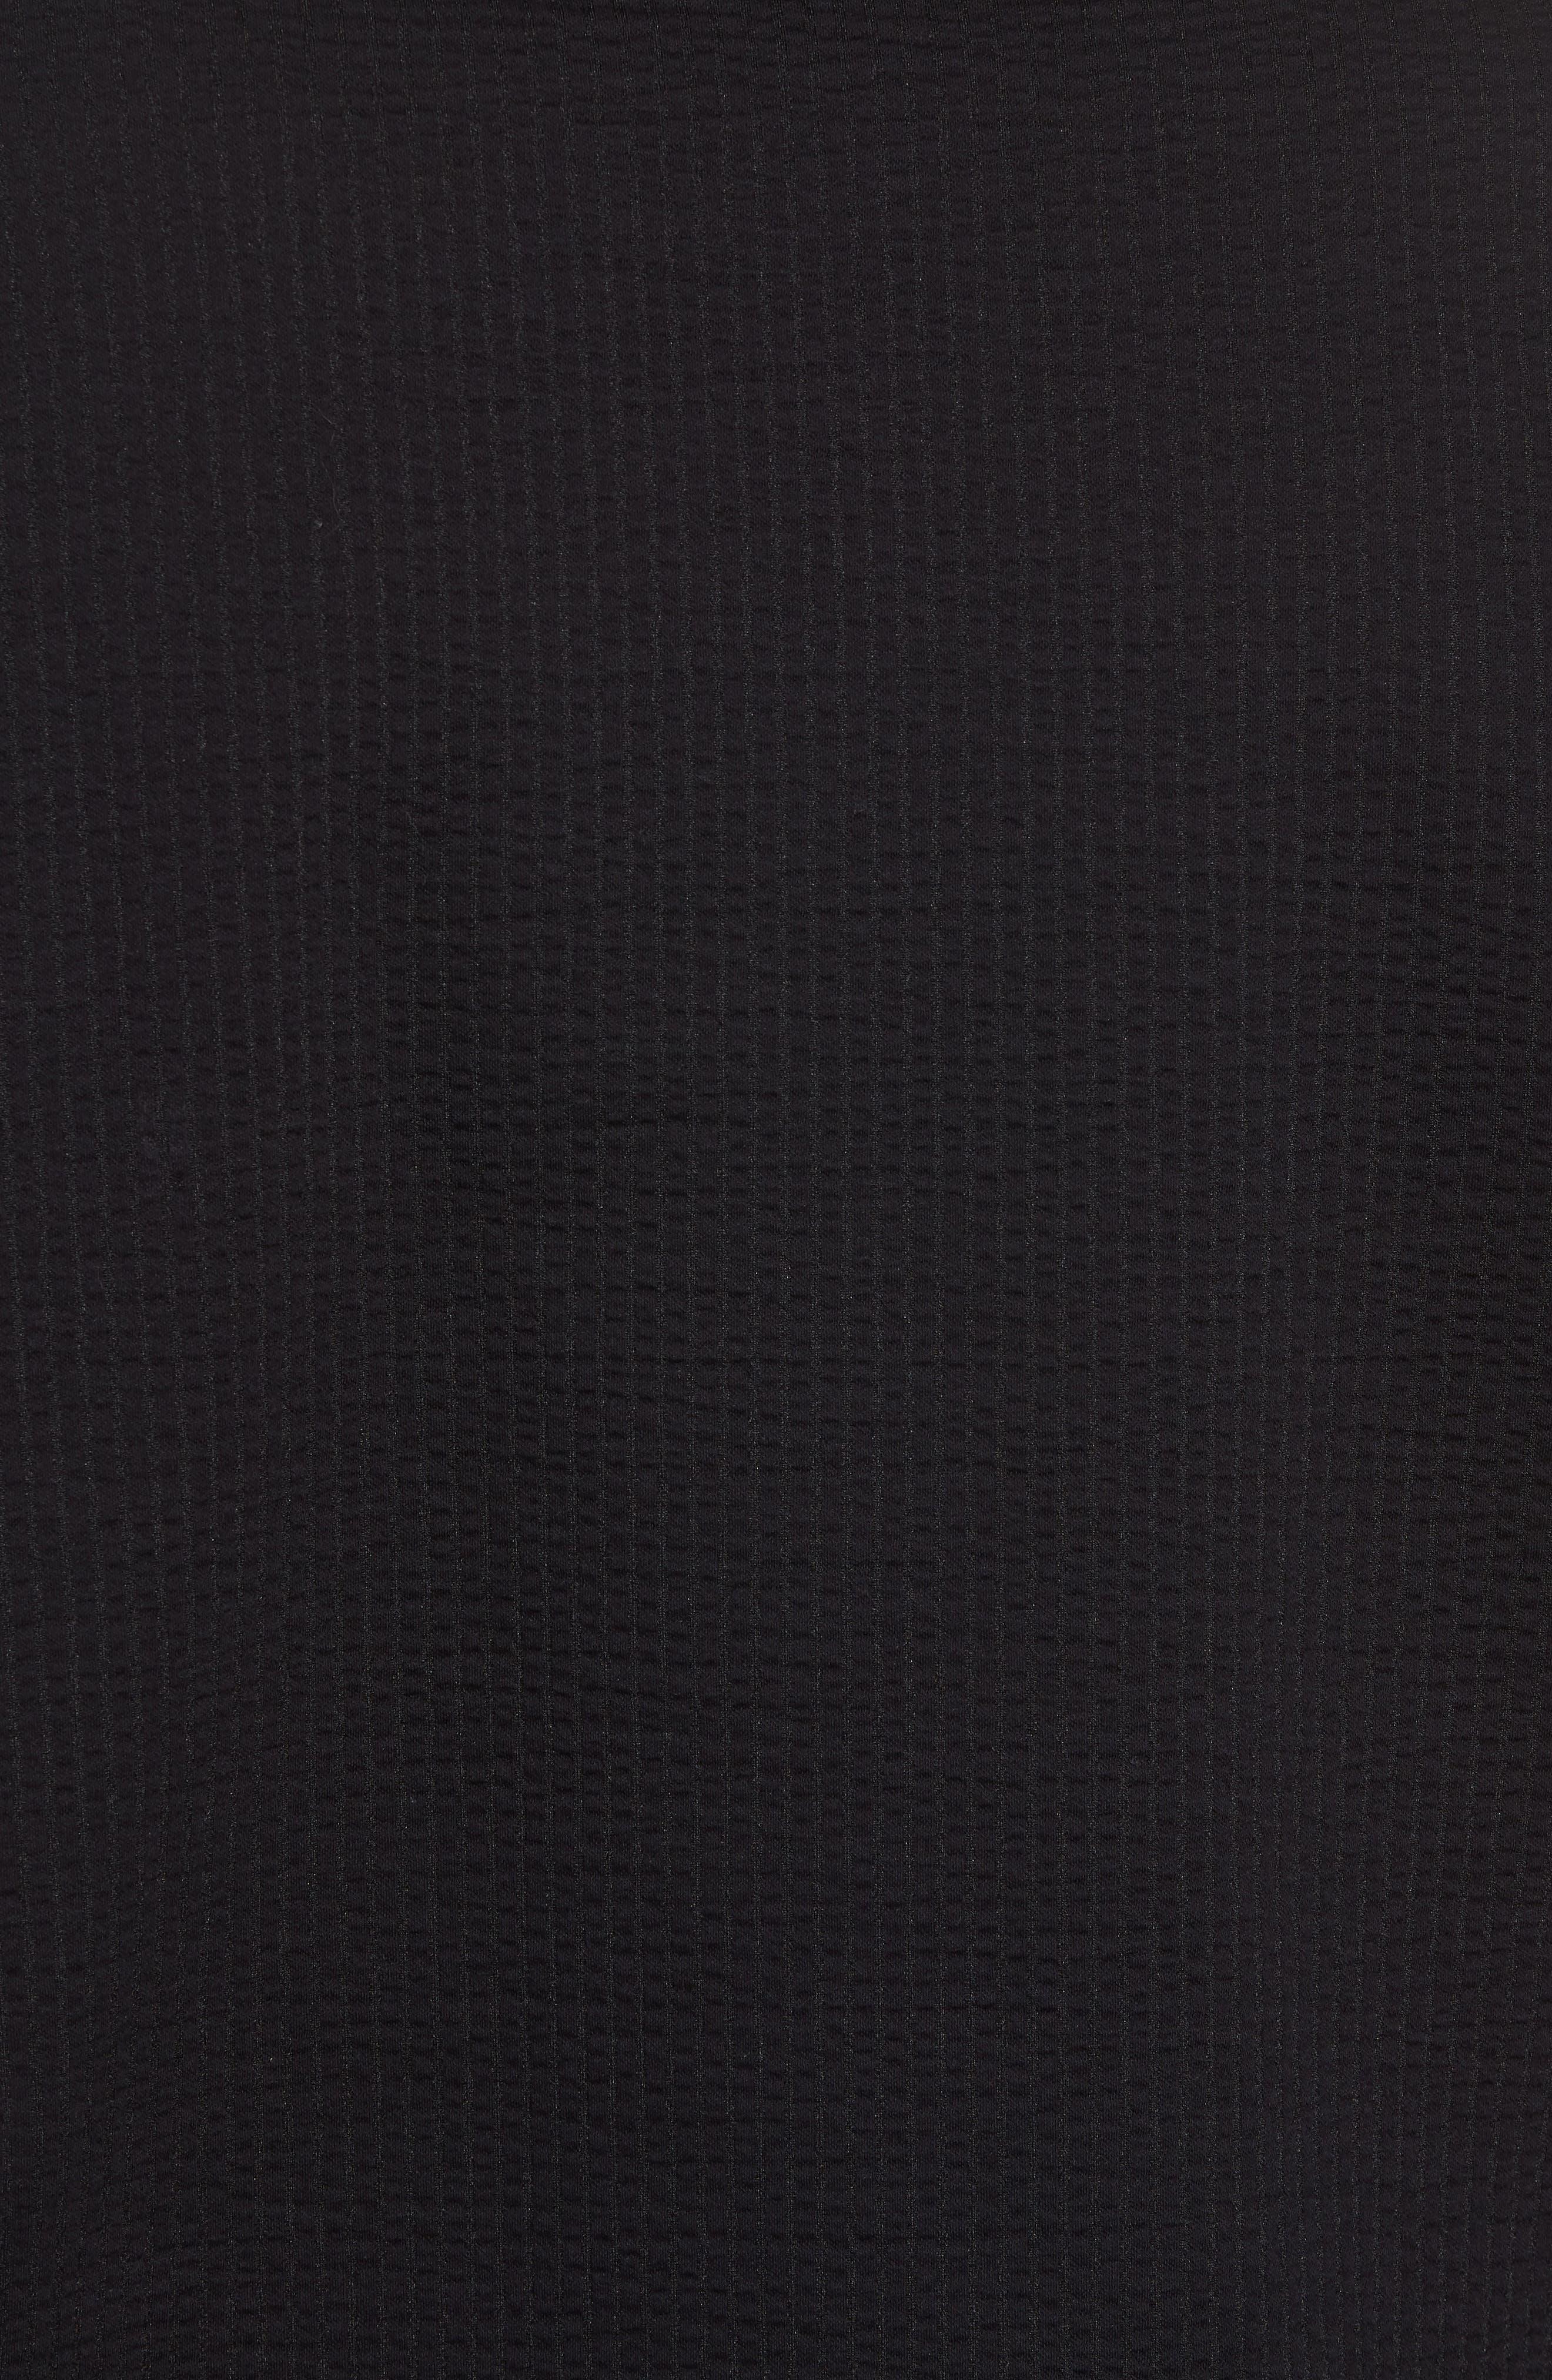 Japanese Seersucker T-Shirt,                             Alternate thumbnail 5, color,                             Black Seersucker